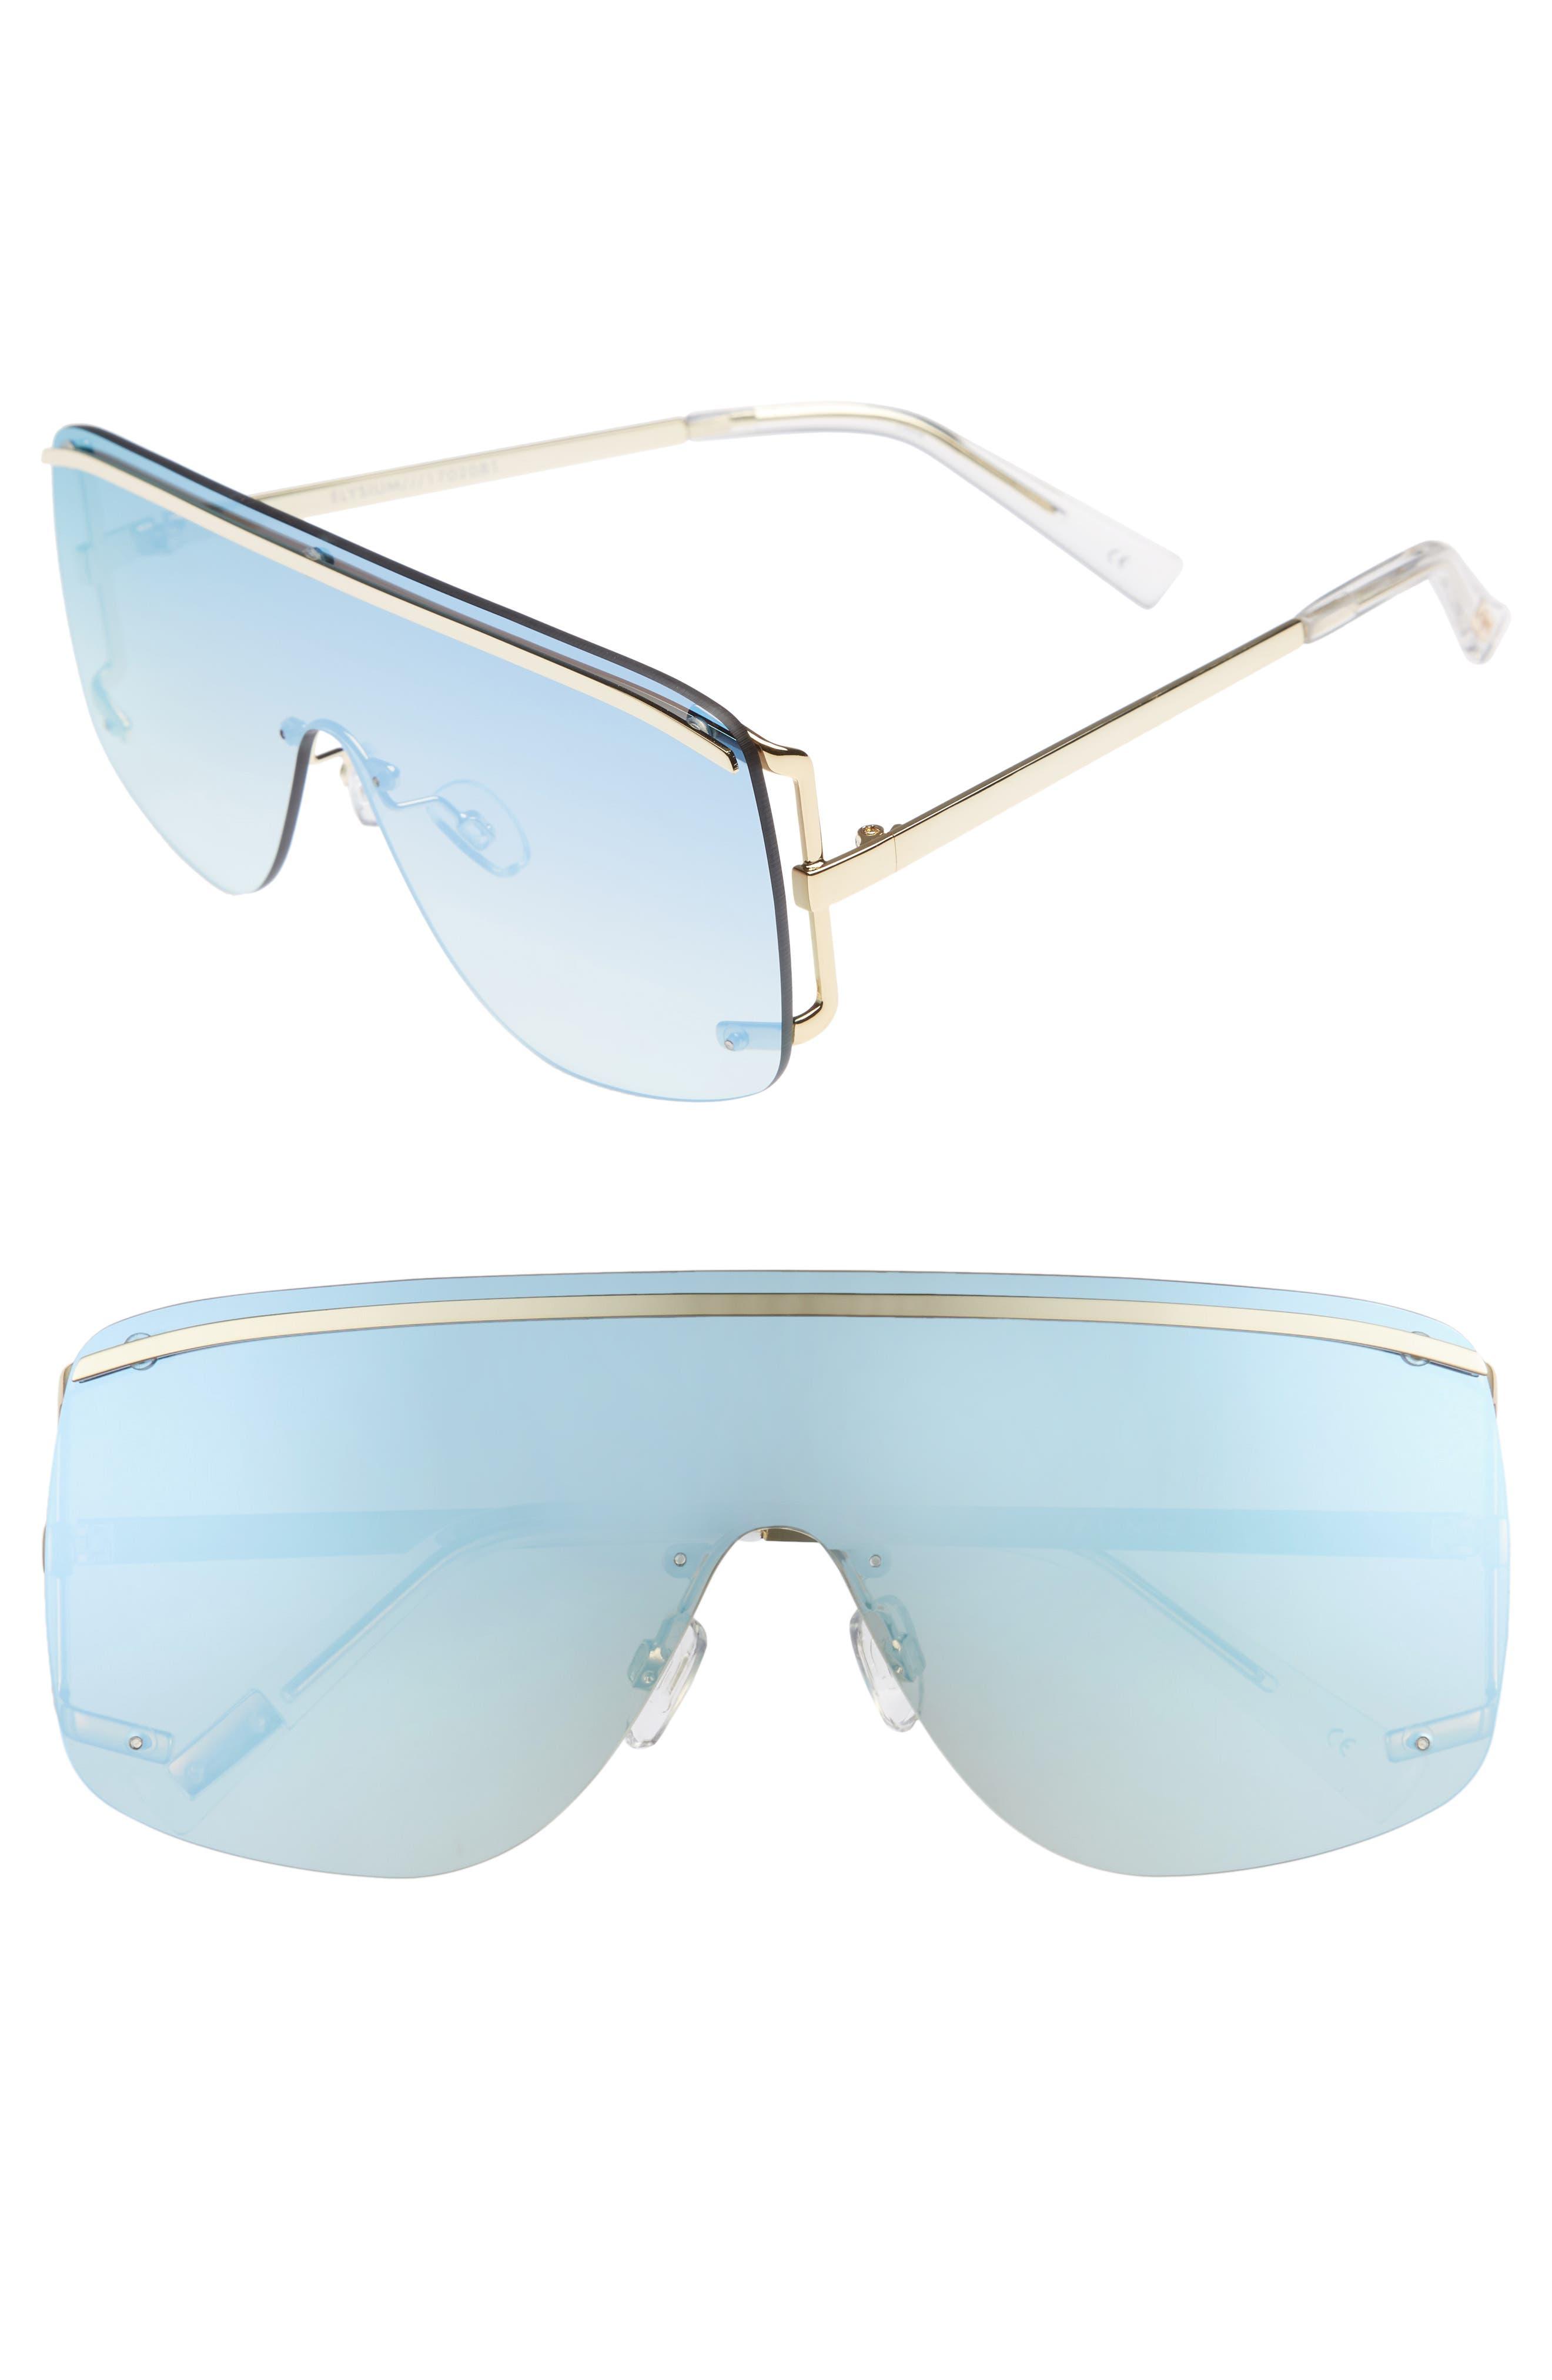 Elysium 140mm Shield Sunglasses,                             Main thumbnail 1, color,                             Bright Gold